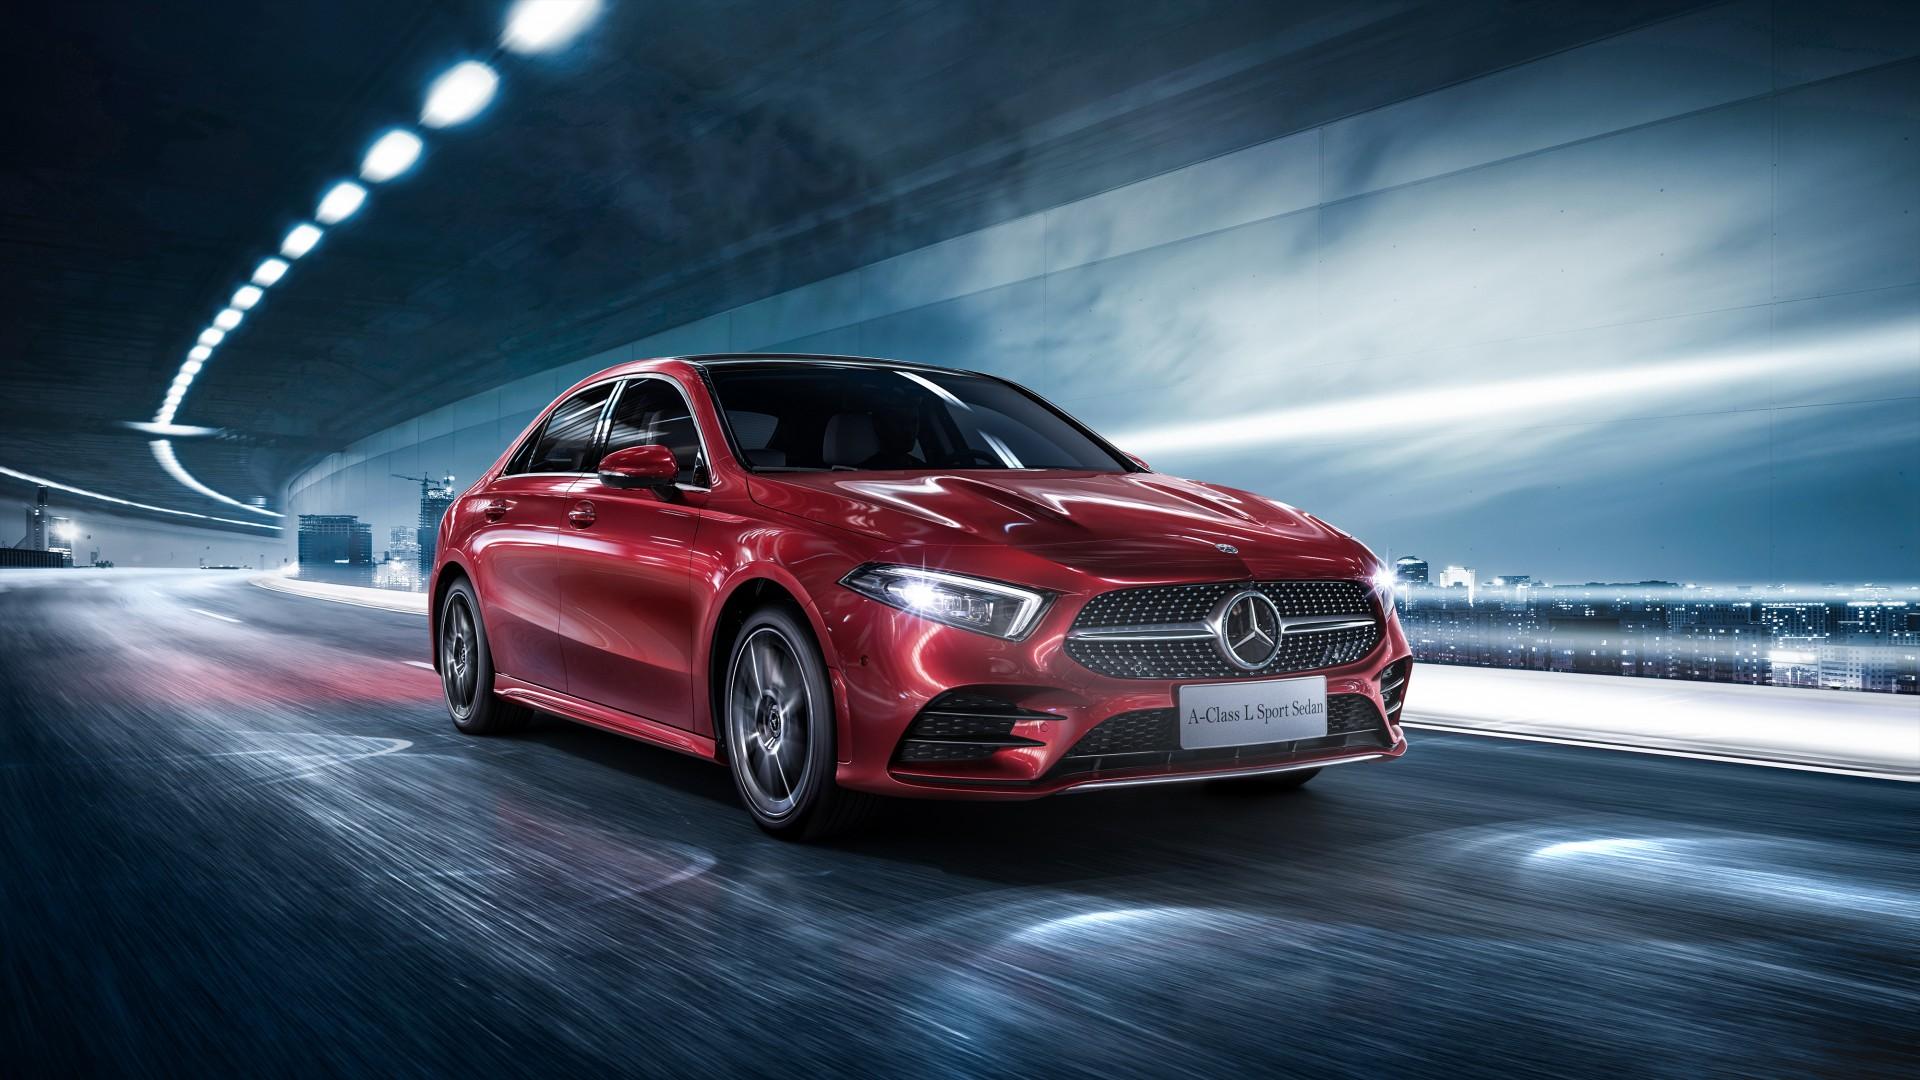 Apple Sport Chevrolet >> 2019 Mercedes Benz A200 L Sport Sedan 4K 2 Wallpaper | HD Car Wallpapers | ID #10312